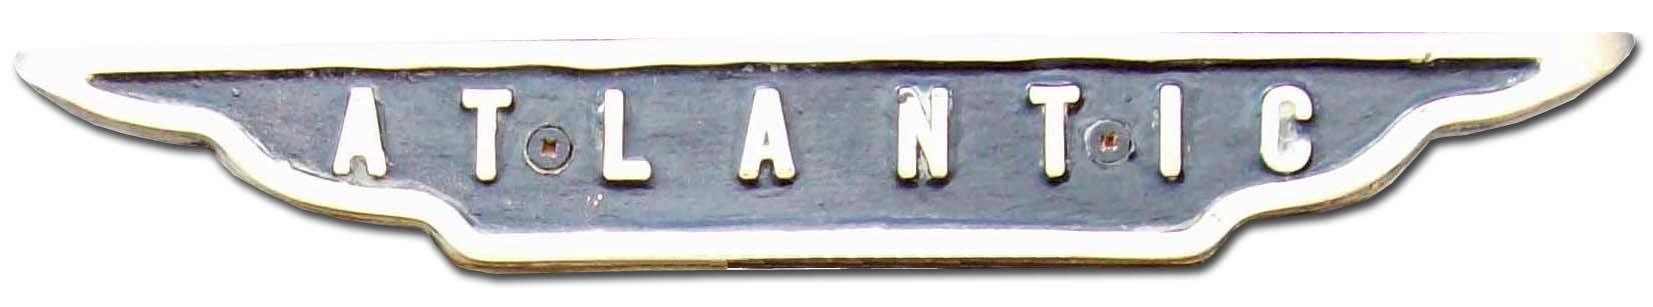 George Rotinoff Motors Ltd (Colbrook). Rotinoff Atlantic GR7 (1957 grill emblem)